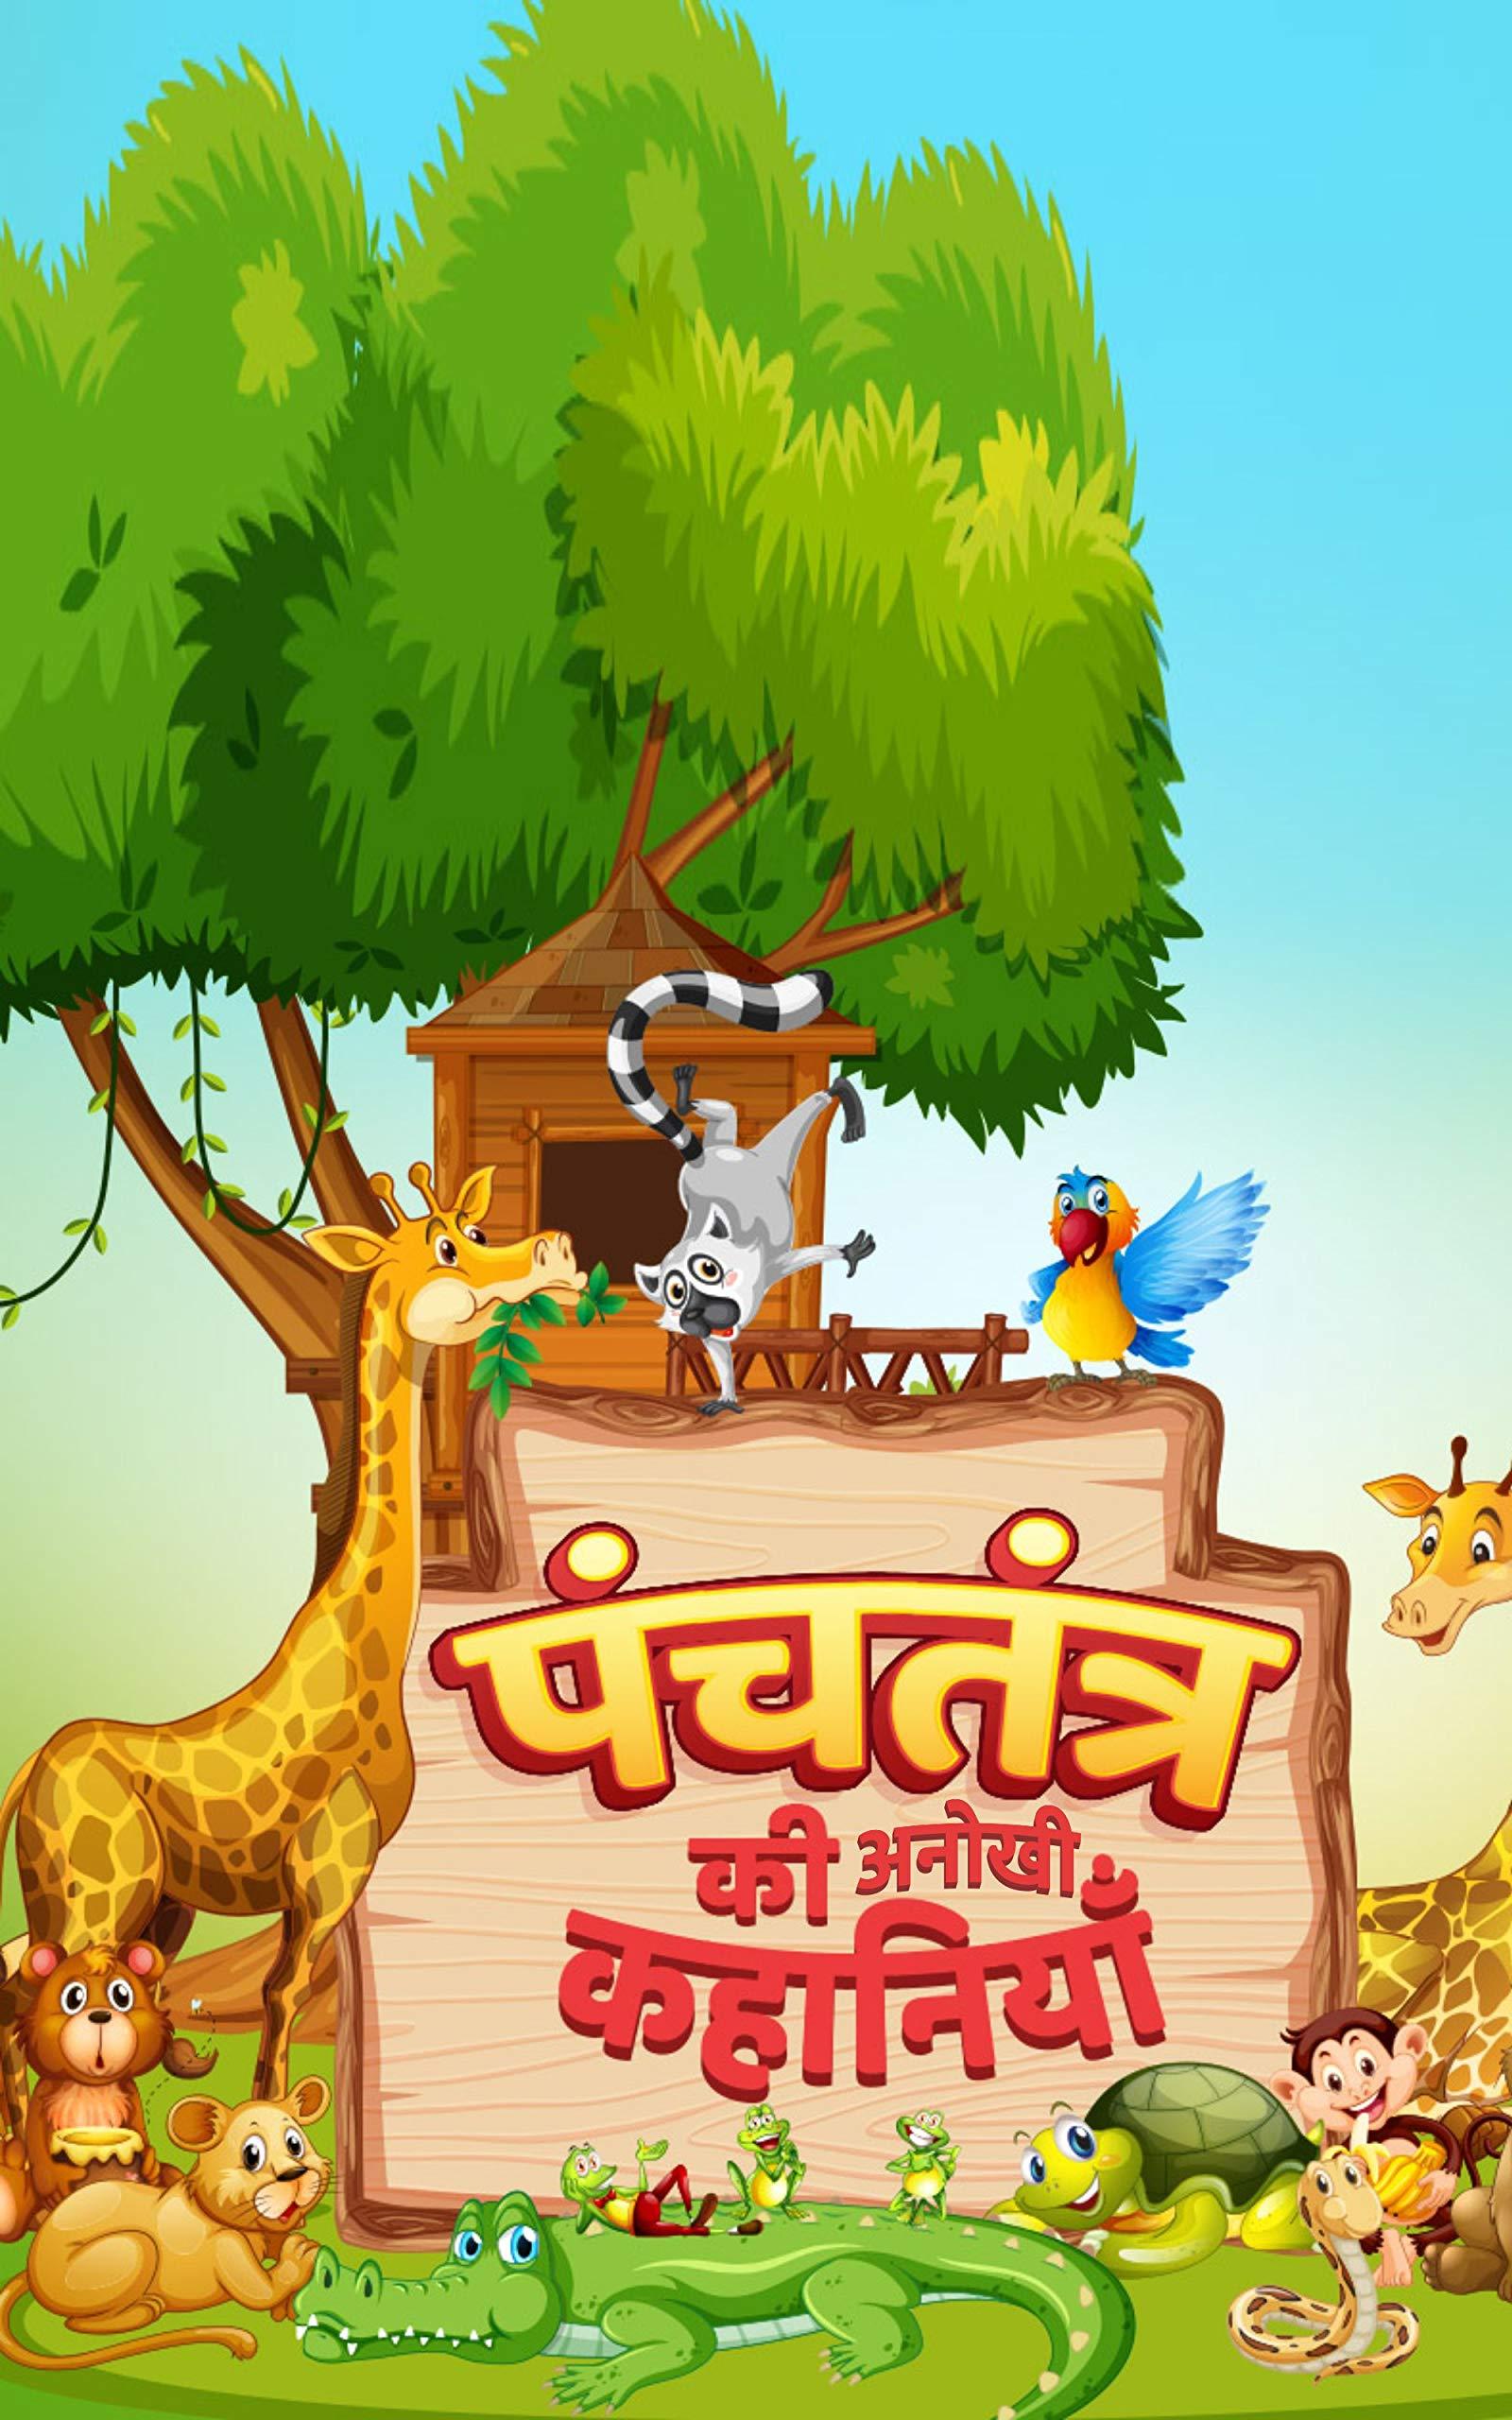 पंचतंत्र की अनोखी कहानियाँ: Amazing Panchtantra Stories for Children (Kids Books Hindi)